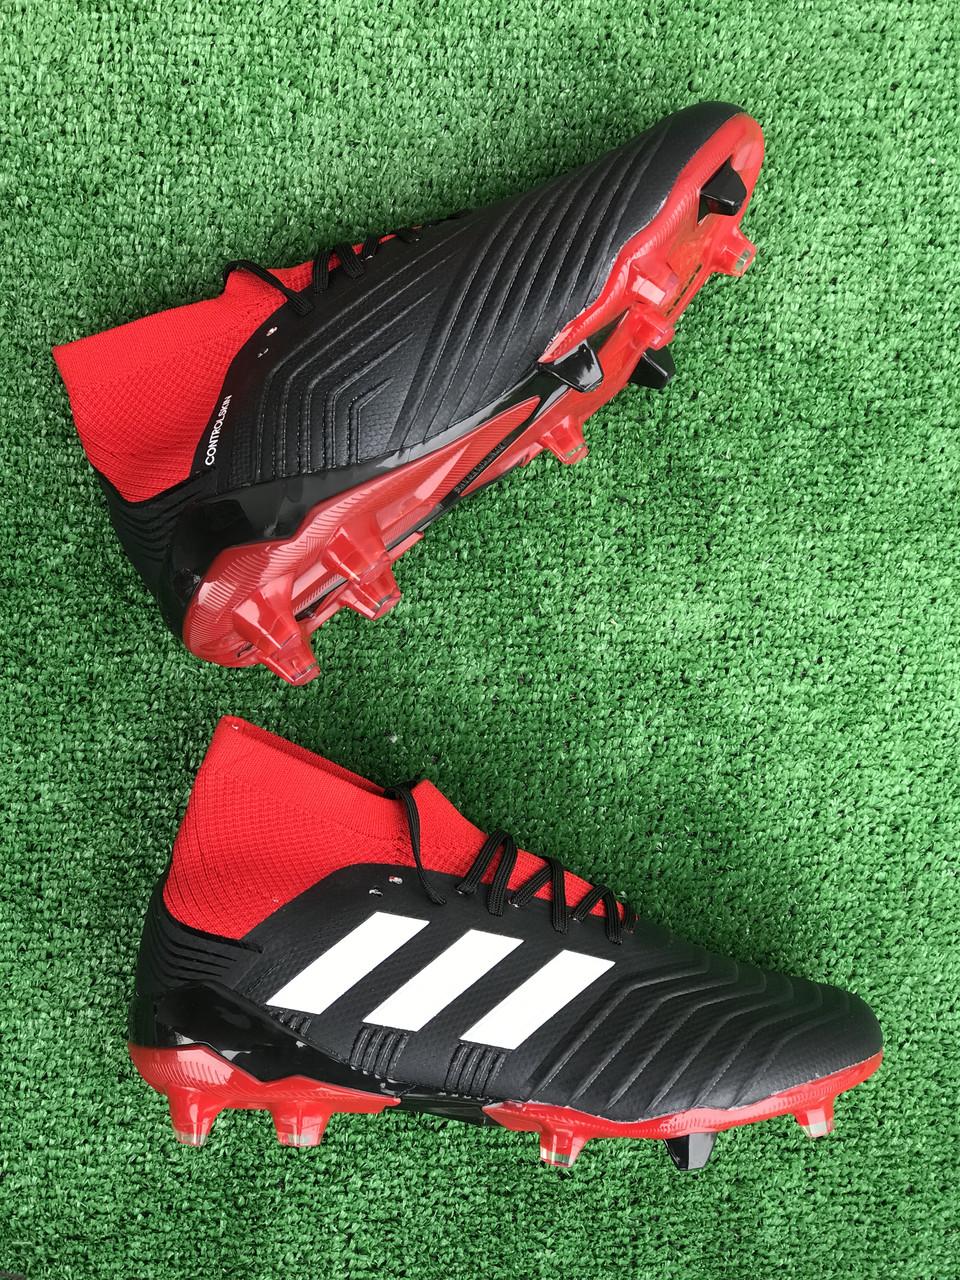 42248a46 Бутсы Adidas Predator 18.1/копы/адидас предатор, цена 1 350 грн ...